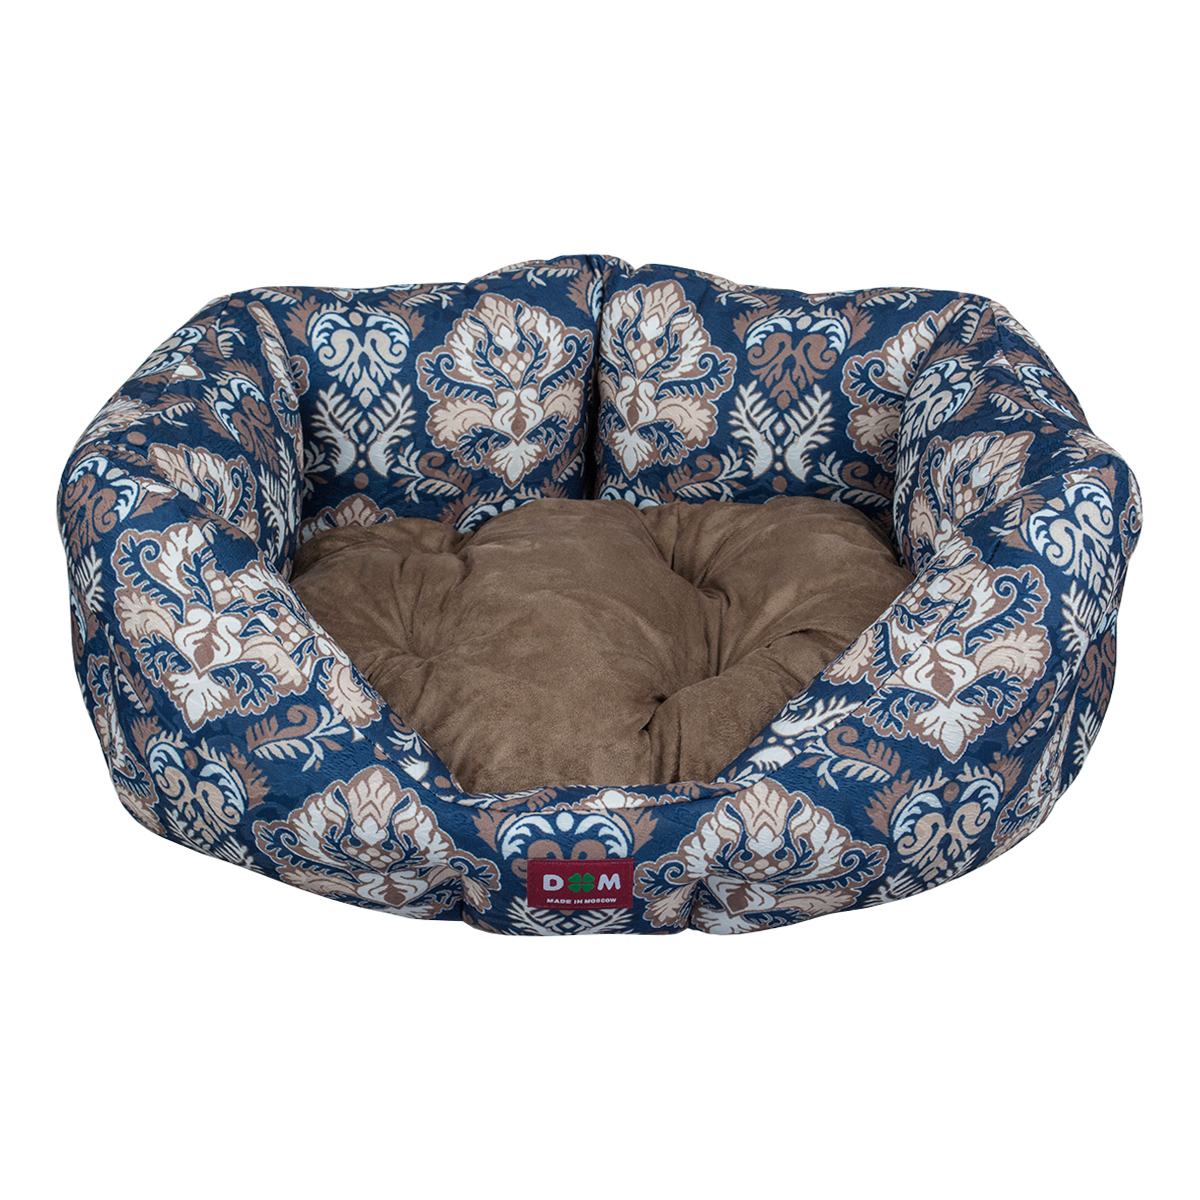 "Лежак для животных Dogmoda ""Барон"", цвет: синий, коричневый, 52 х 48 х 20 см"